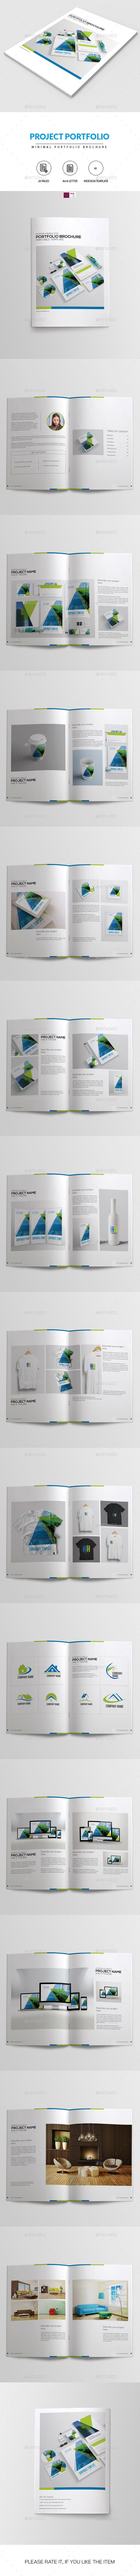 Project Portfolio | Indesign Template - Portfolio Brochures